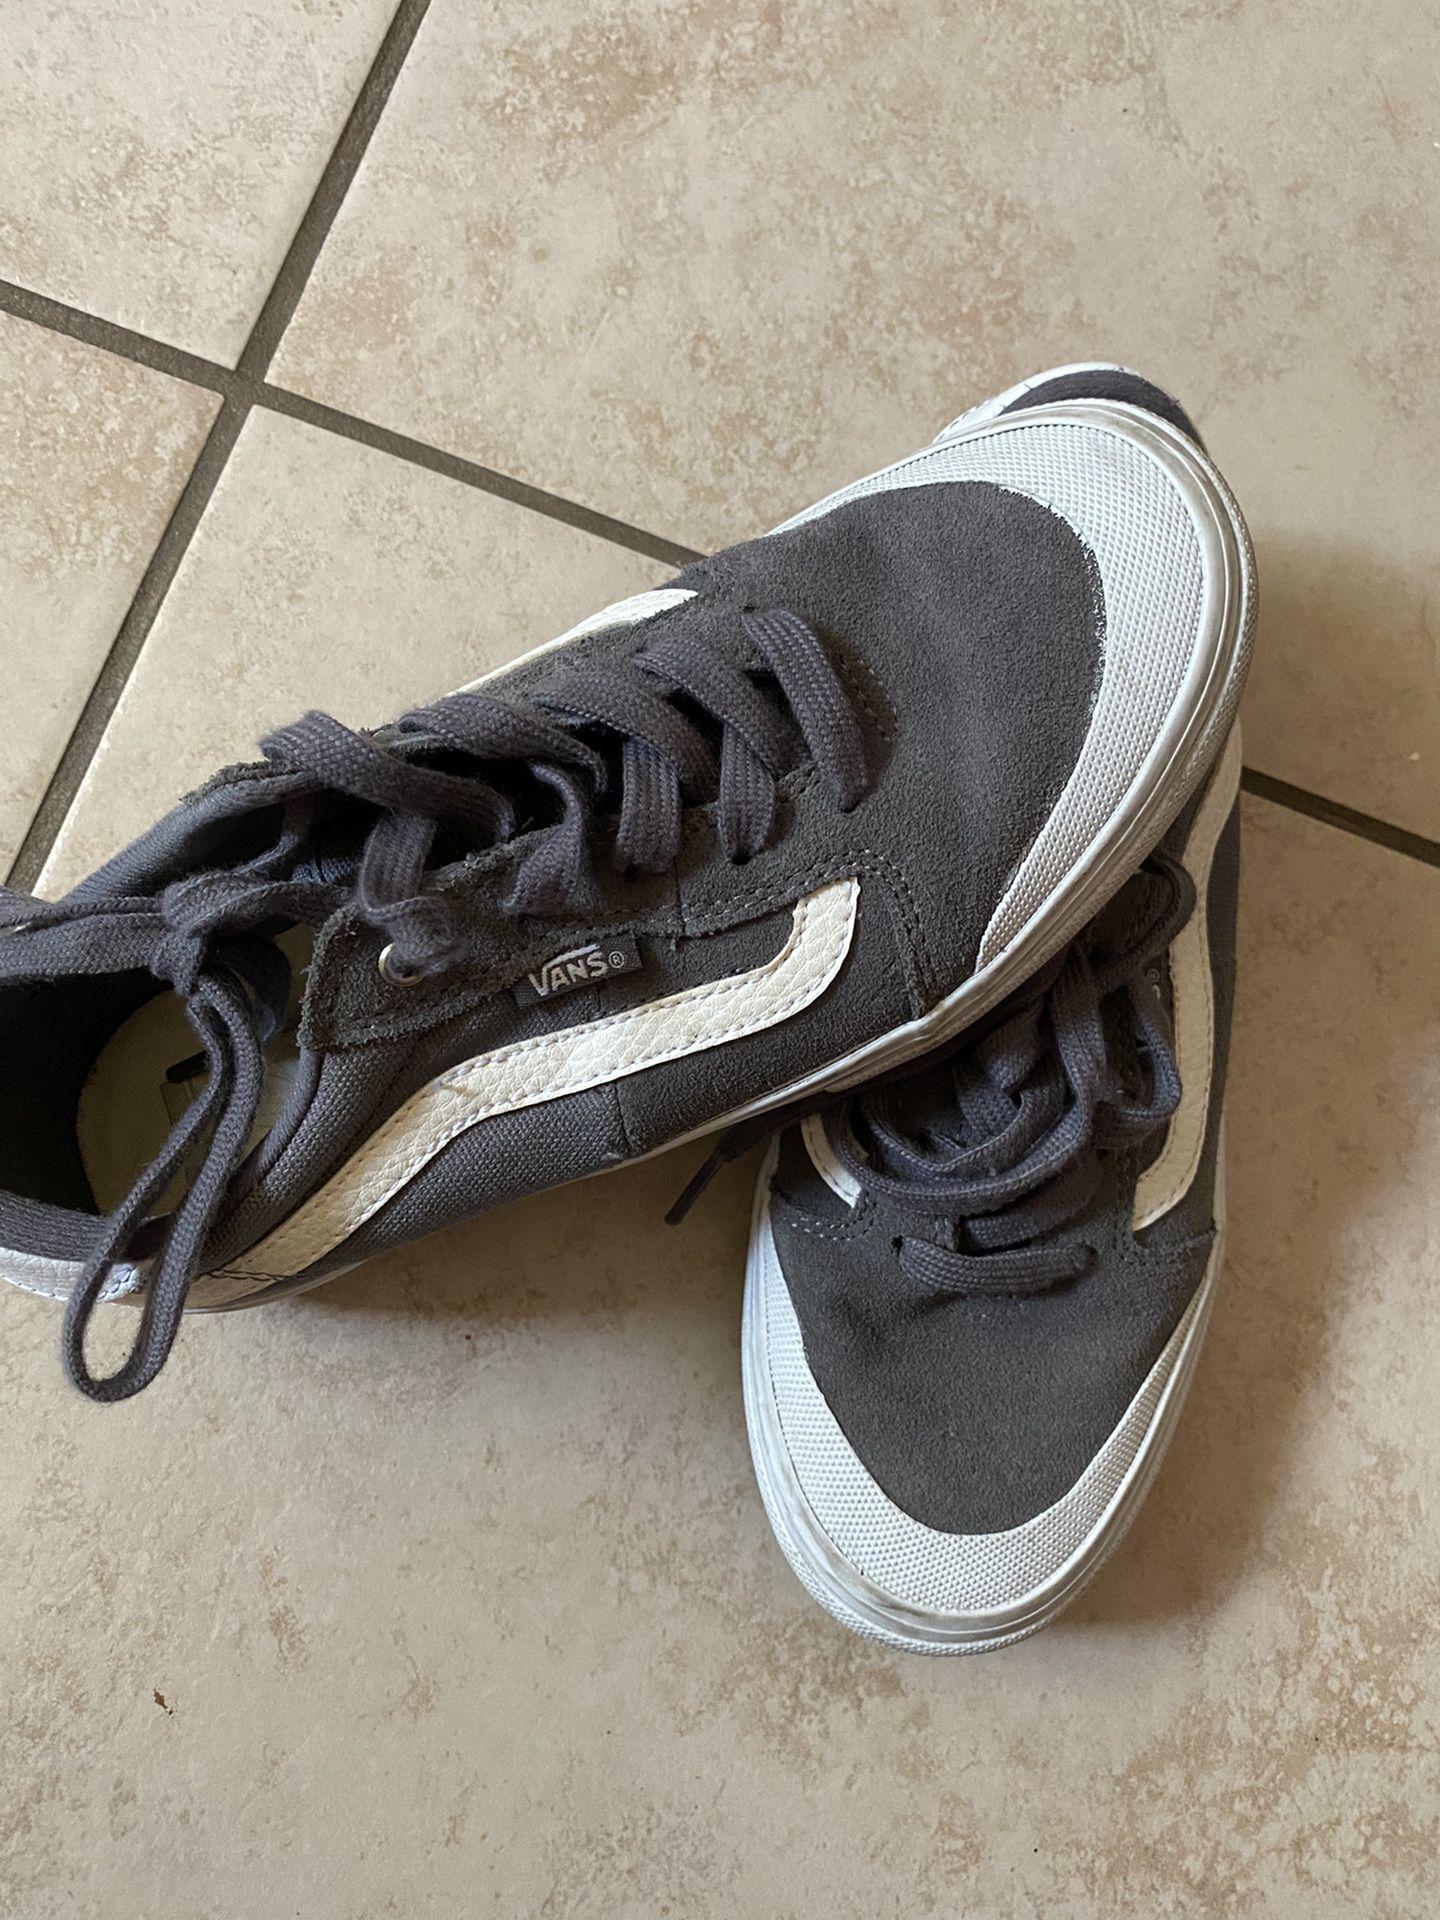 Vans Size 4.5